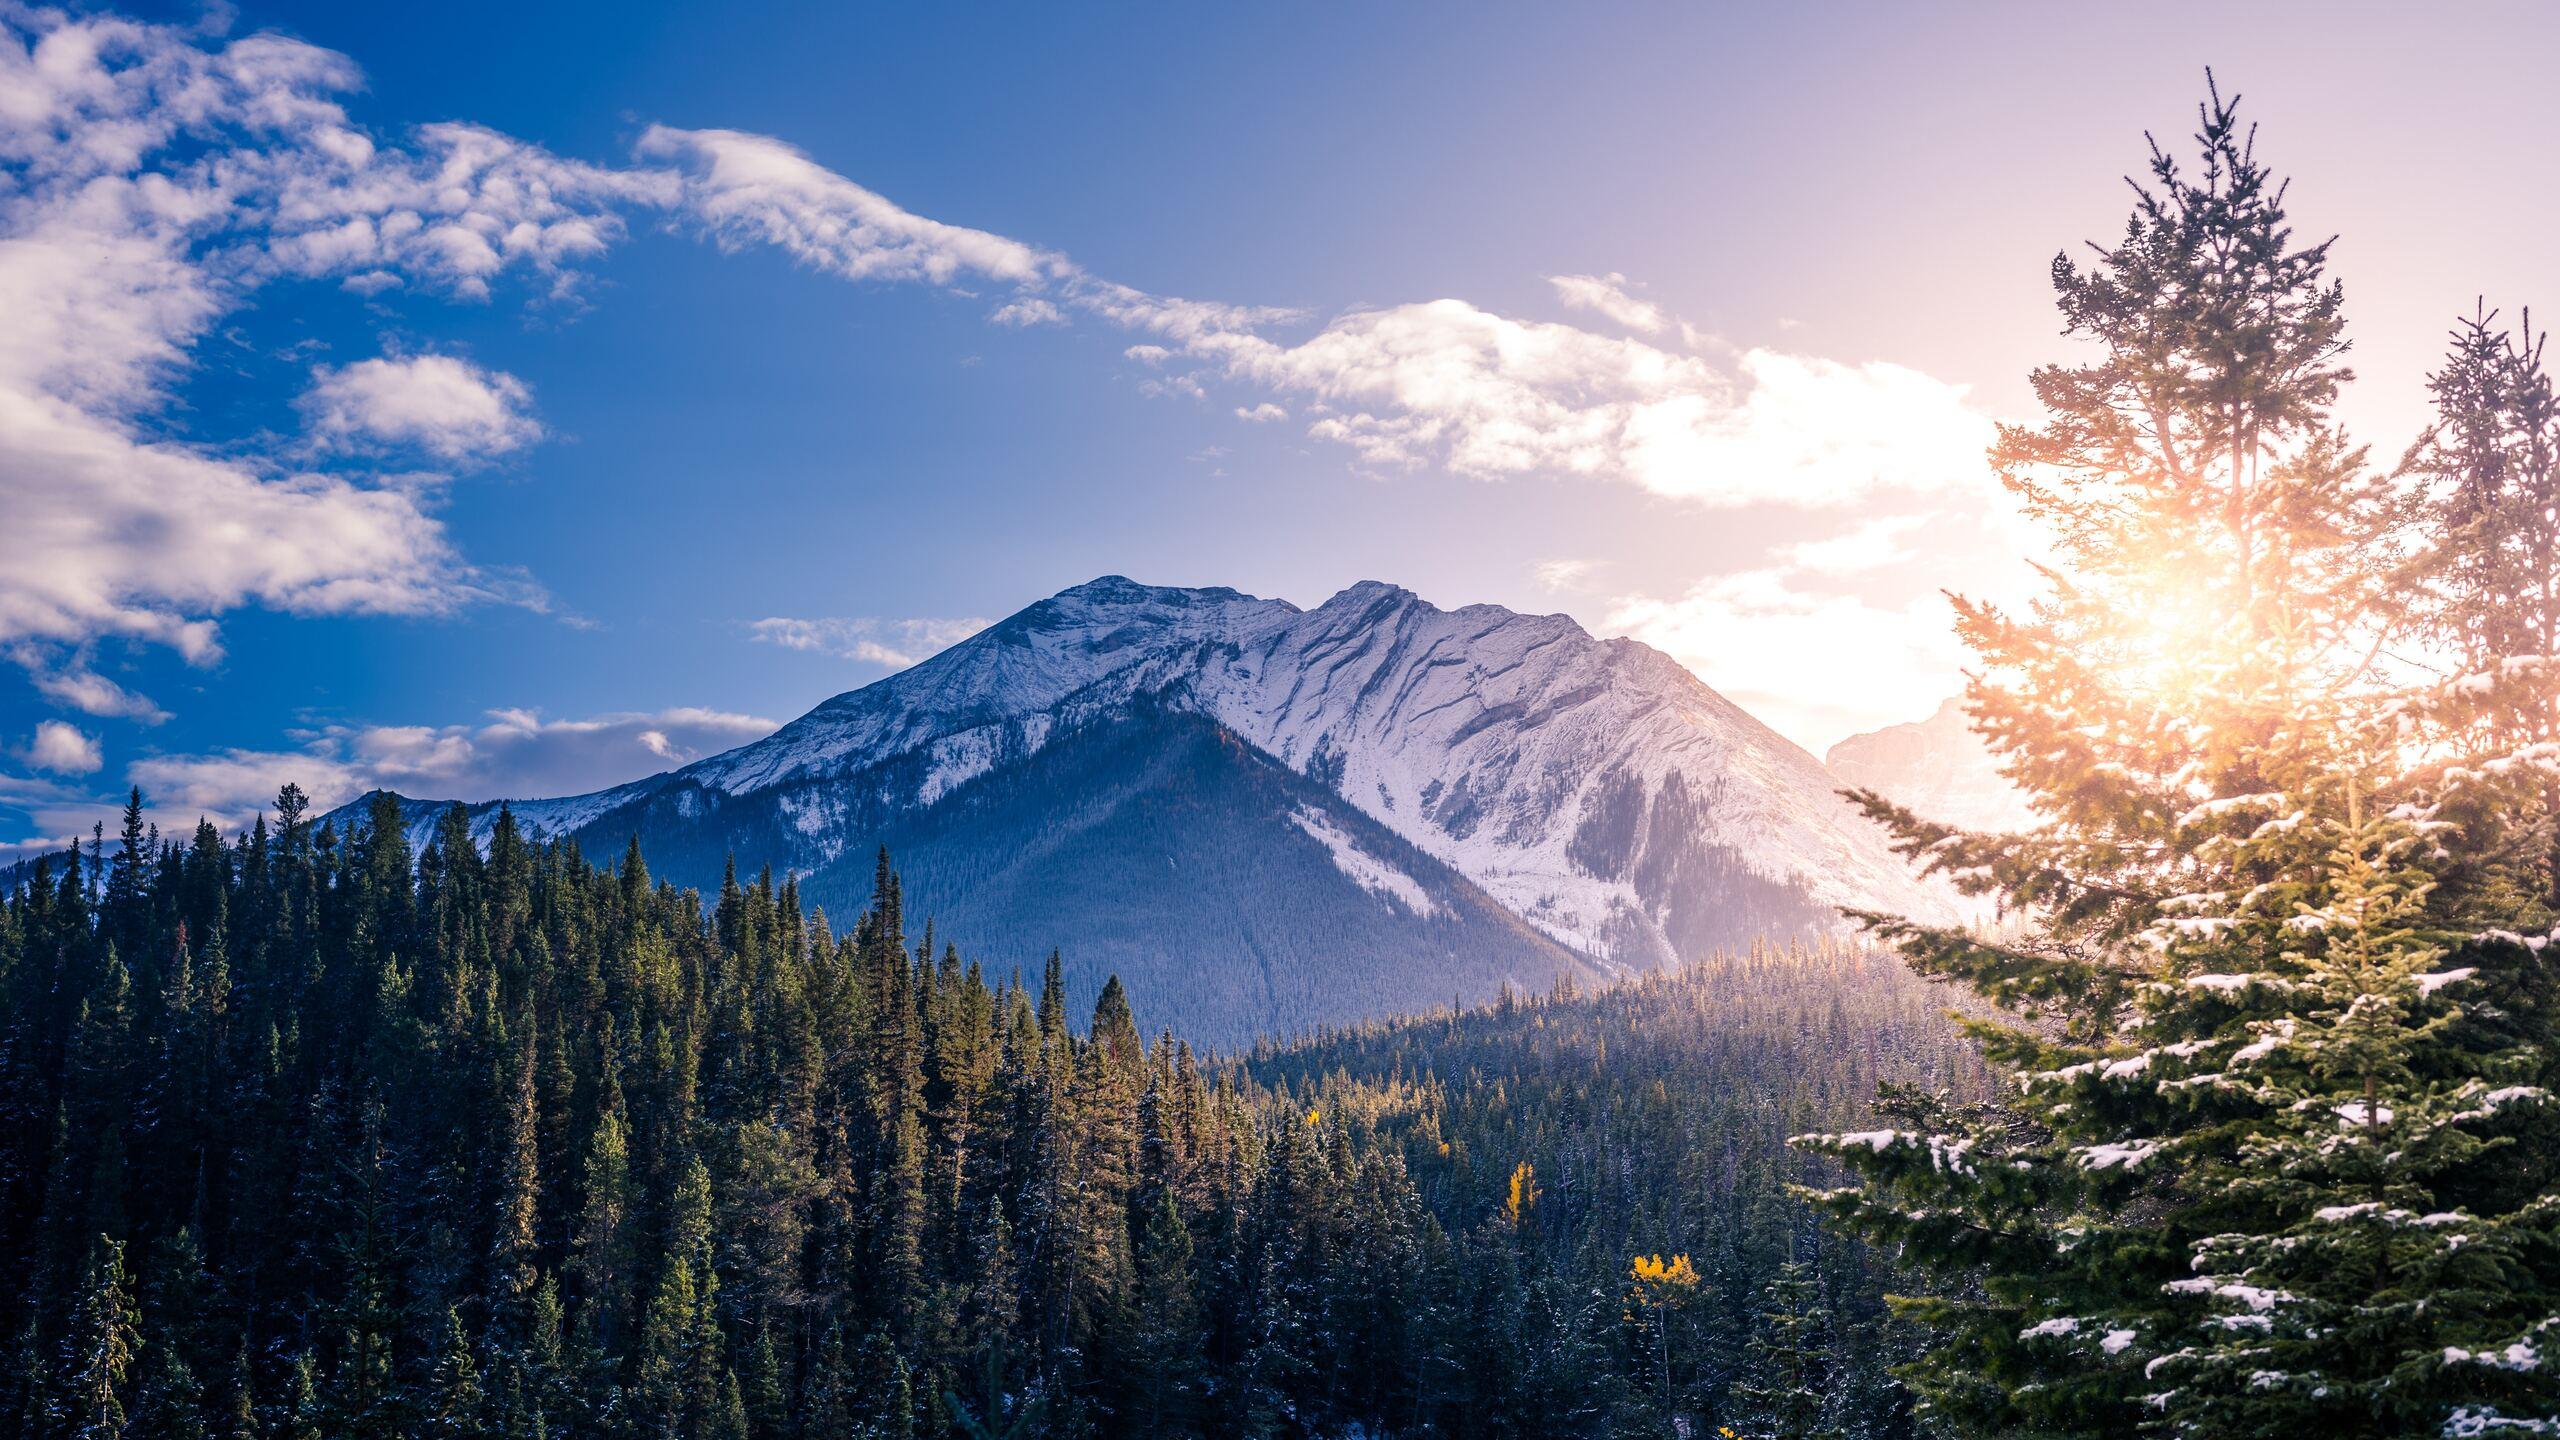 banff-canada-landscape-5k-8p.jpg